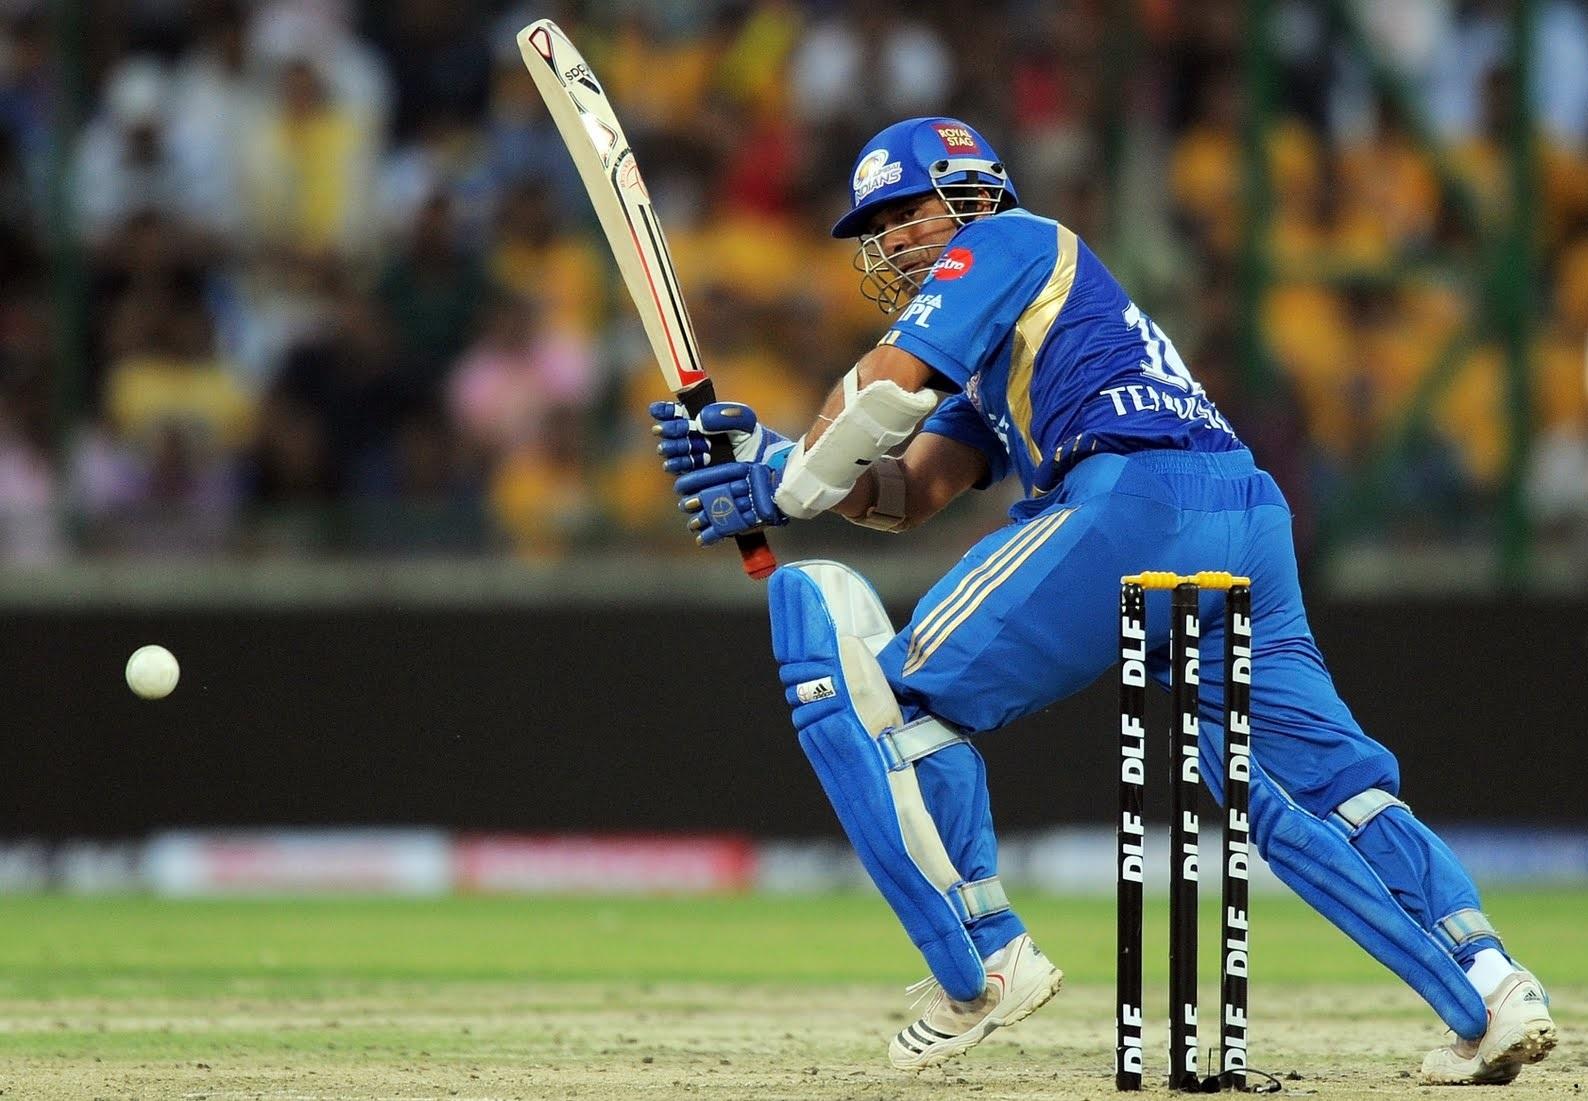 Hd wallpaper cricket - Sachin Tendulkar